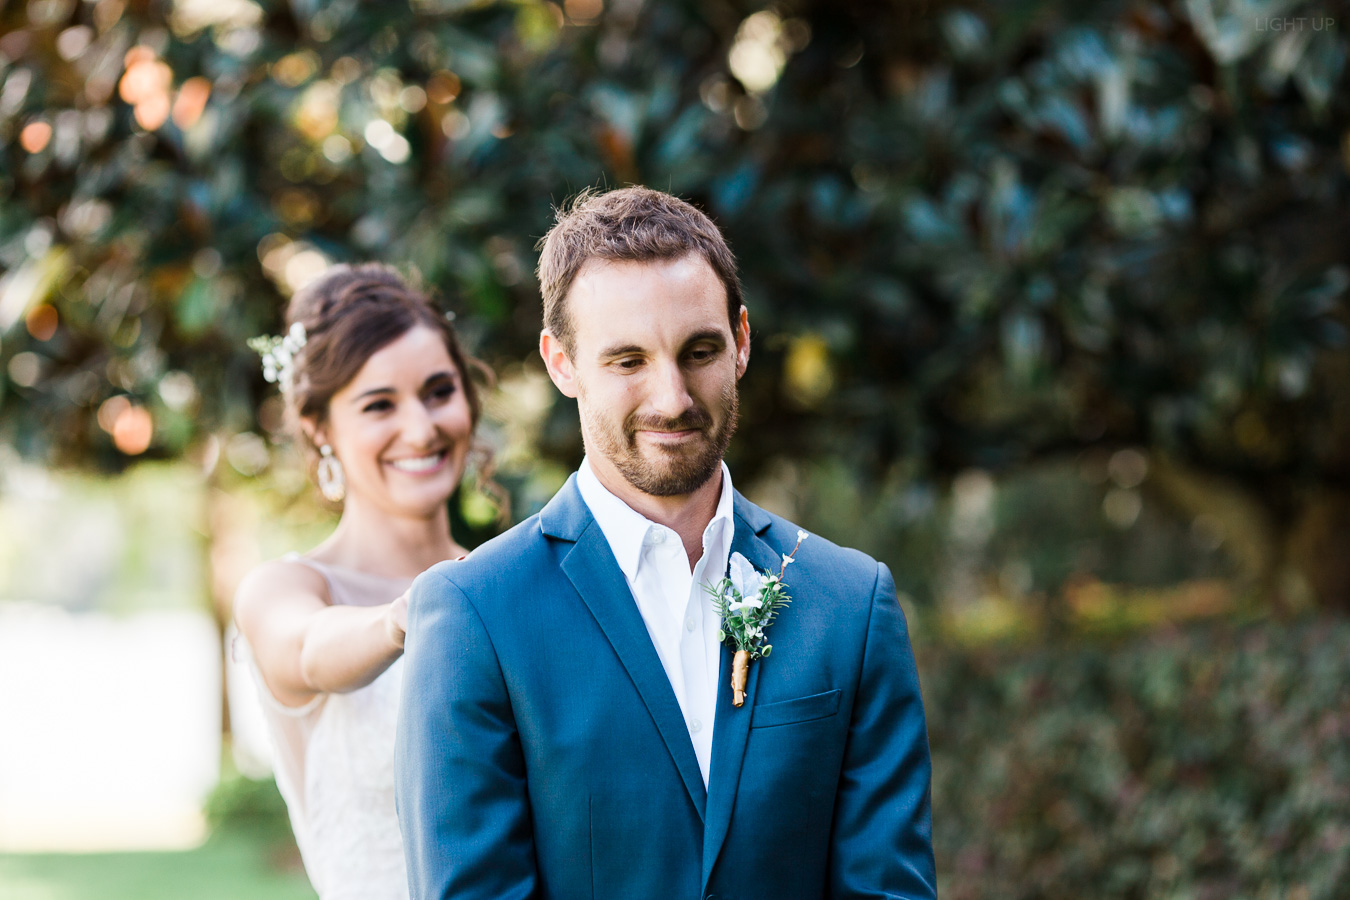 Wedding-photographer-orlando-29.jpg